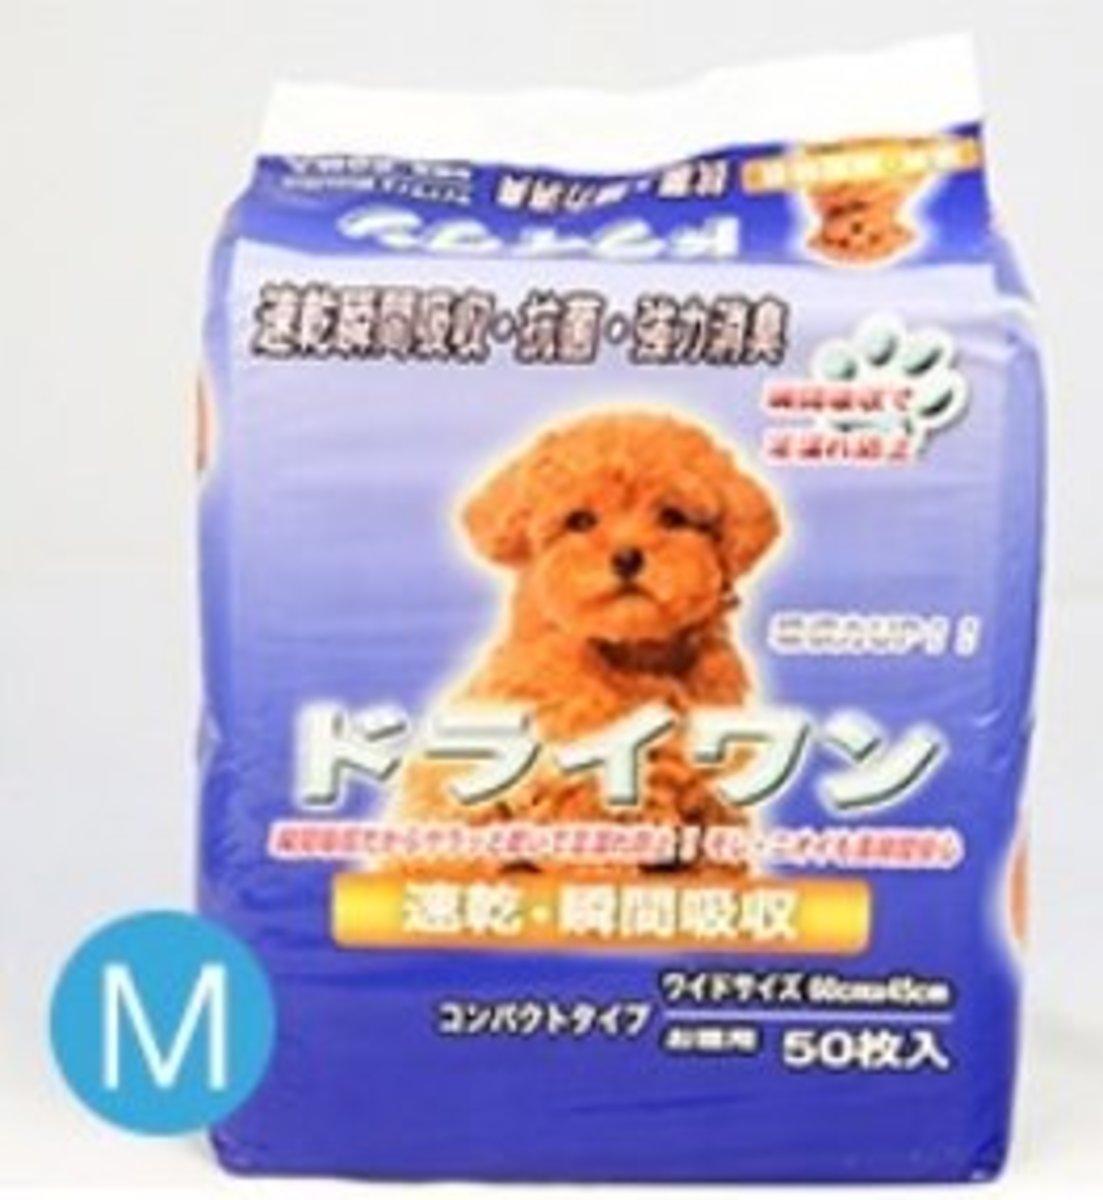 Depend Quick-Dry Pet Pads Dog Pads Dog Diapers-Medium Size (50 Pieces)